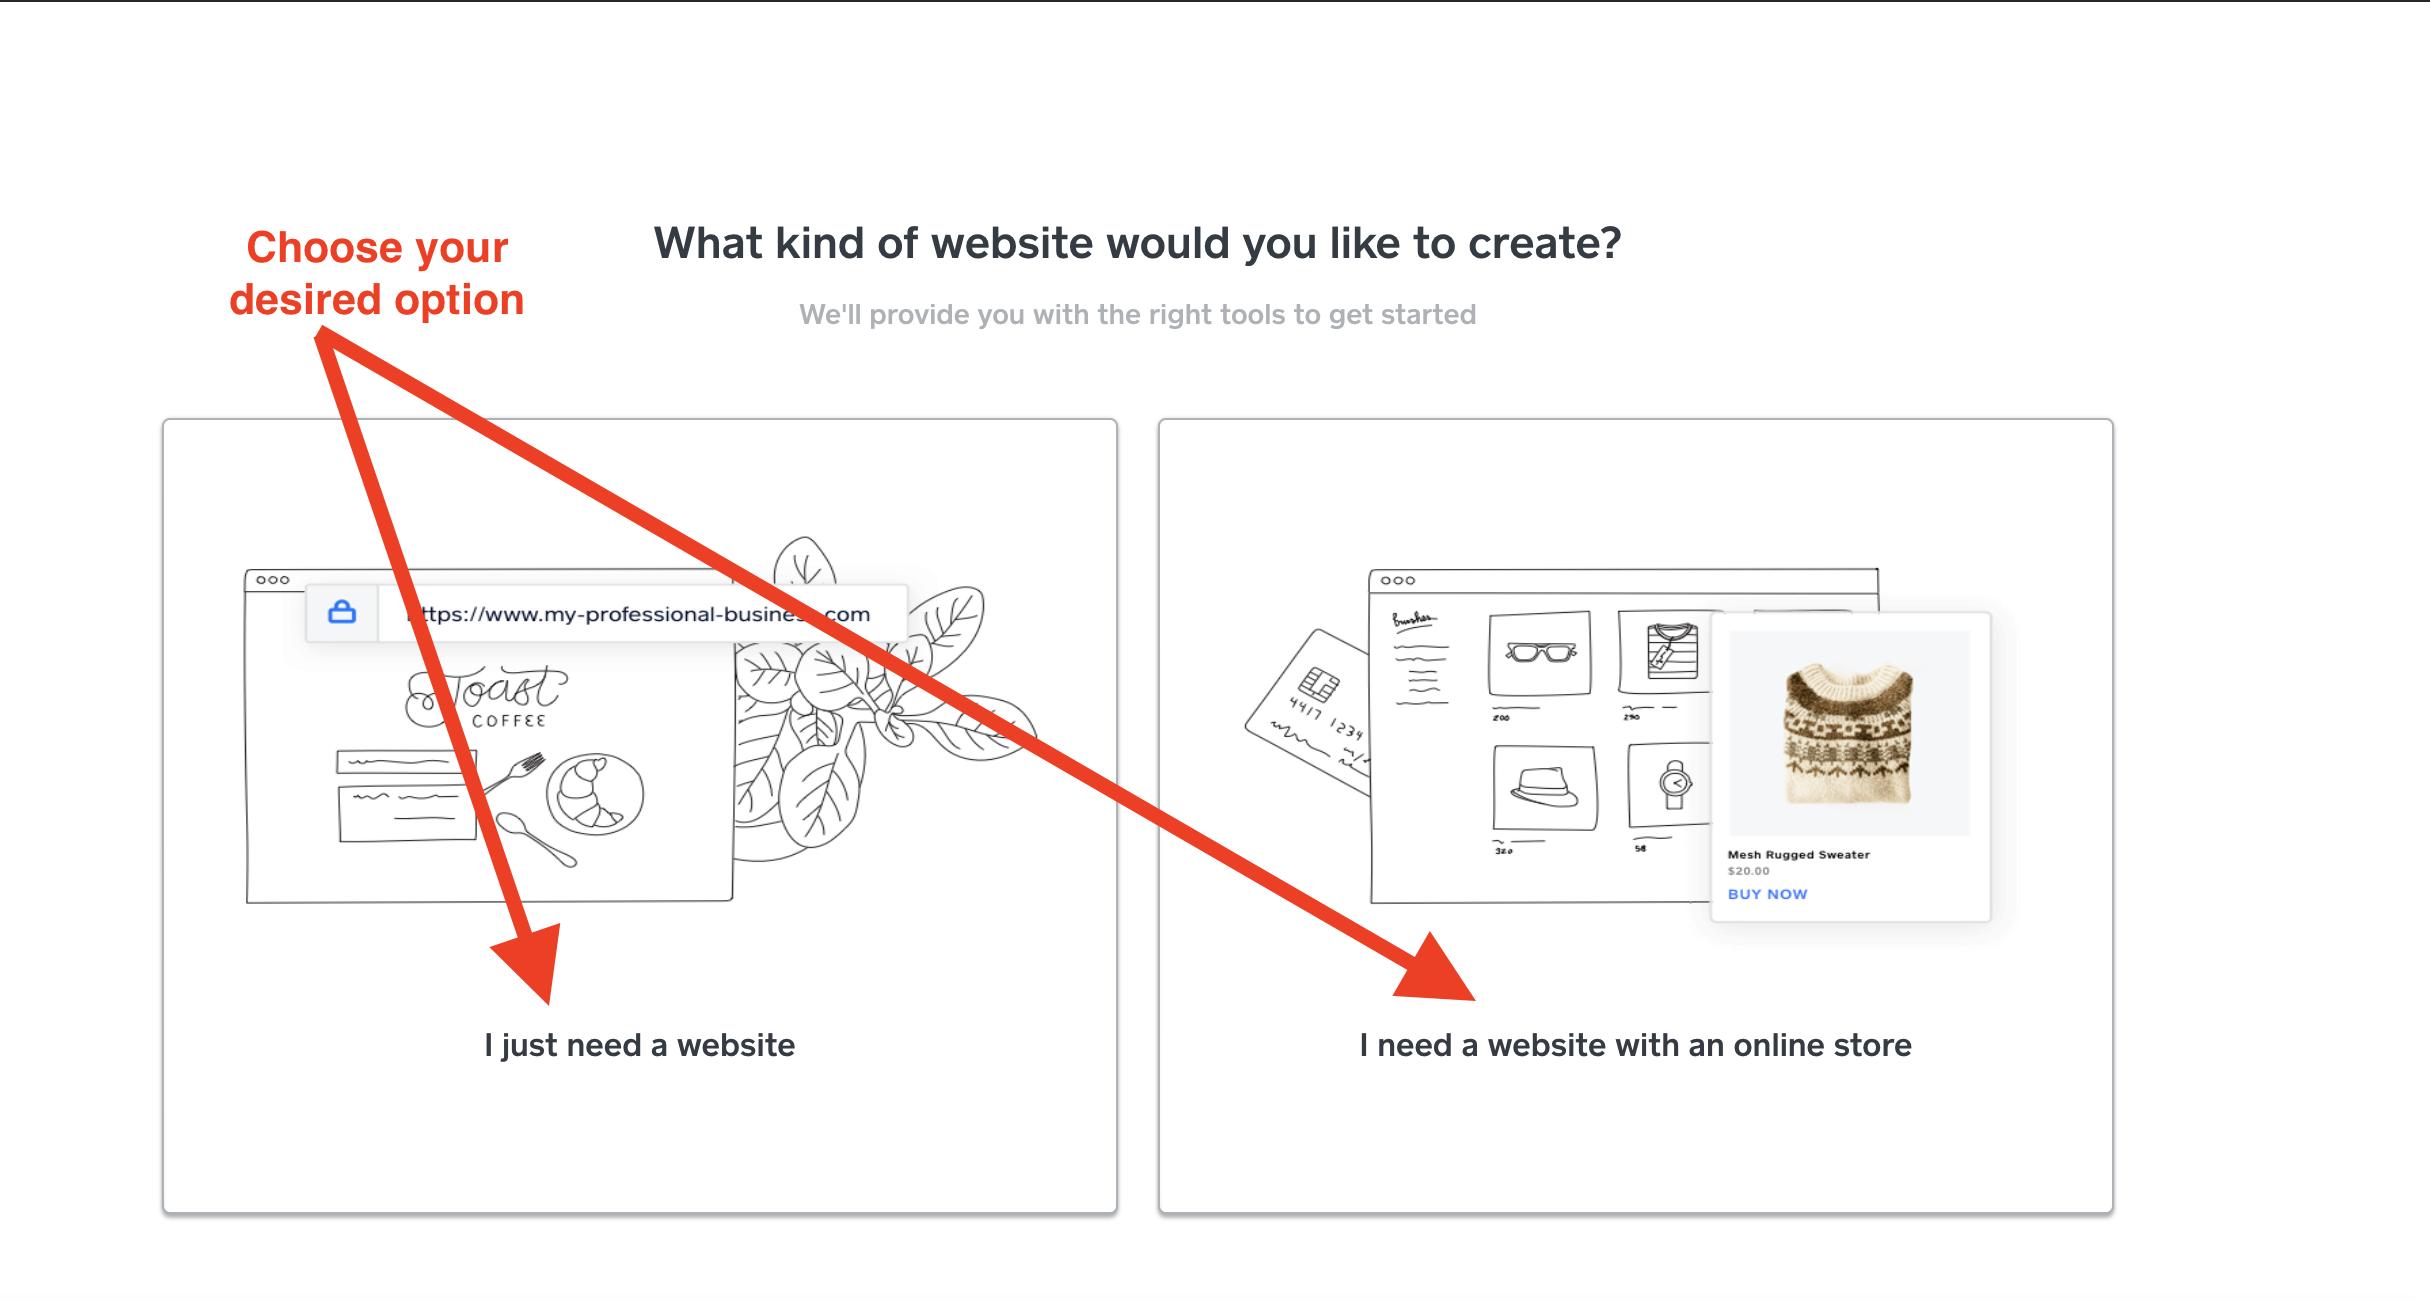 online store or website